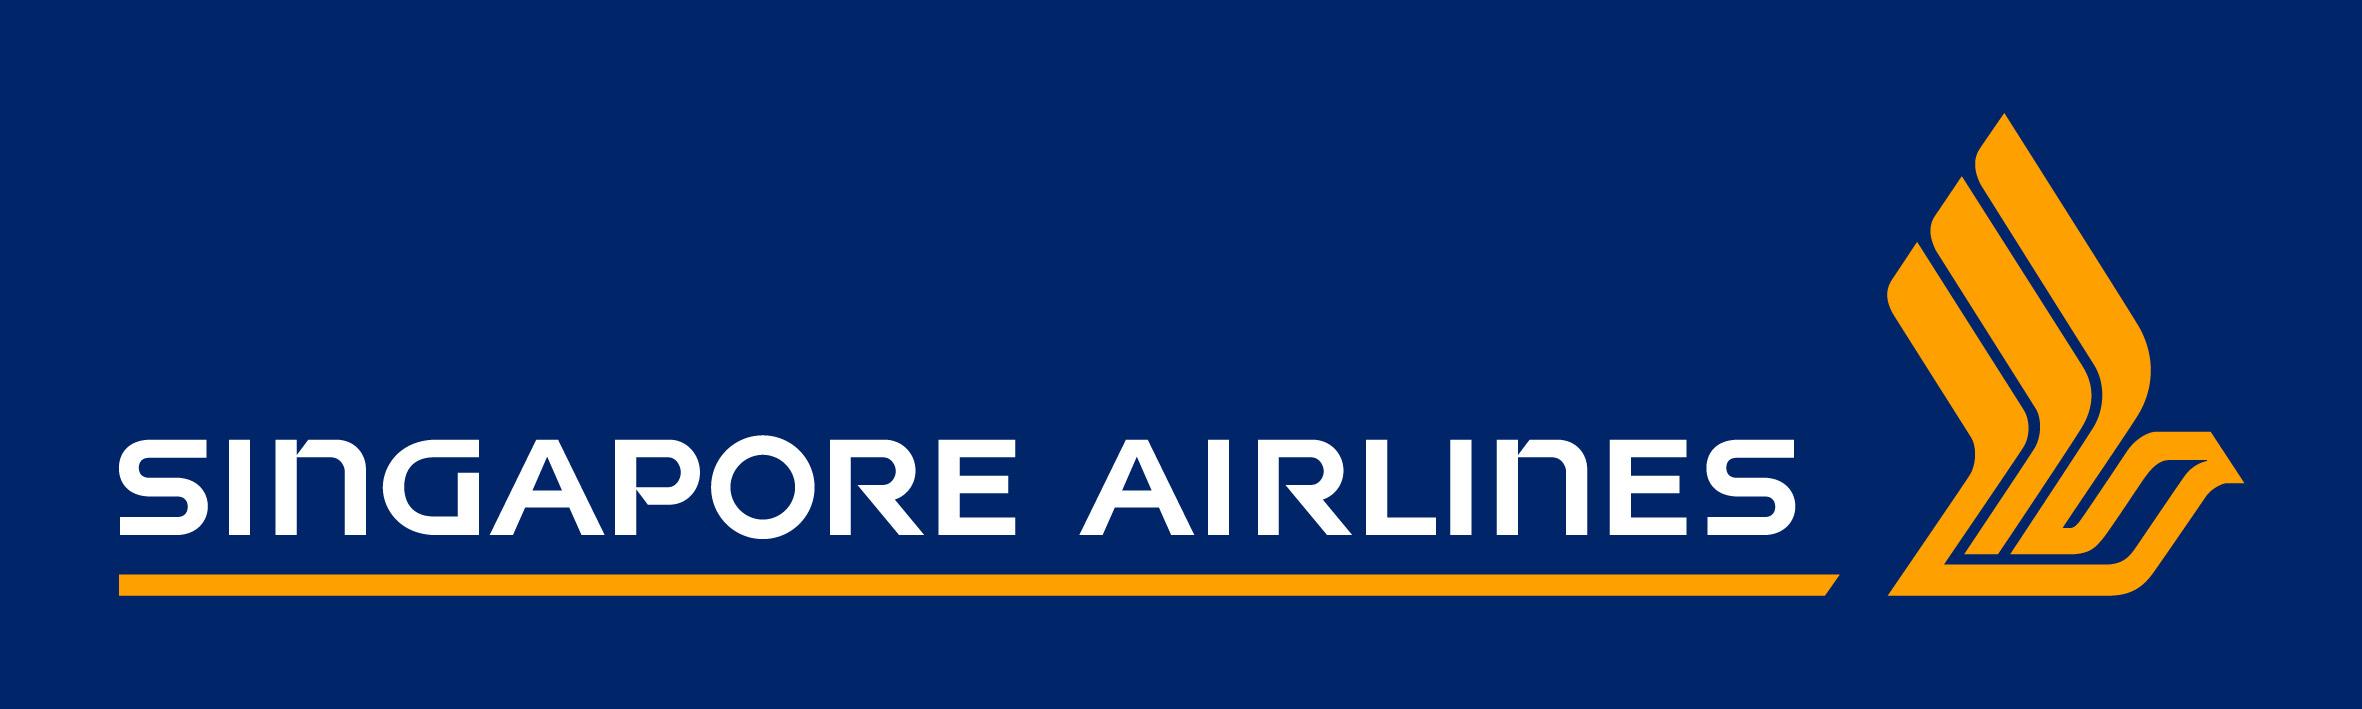 Логотип Сингапурских авиалиний (Singapore Airlines Logo)